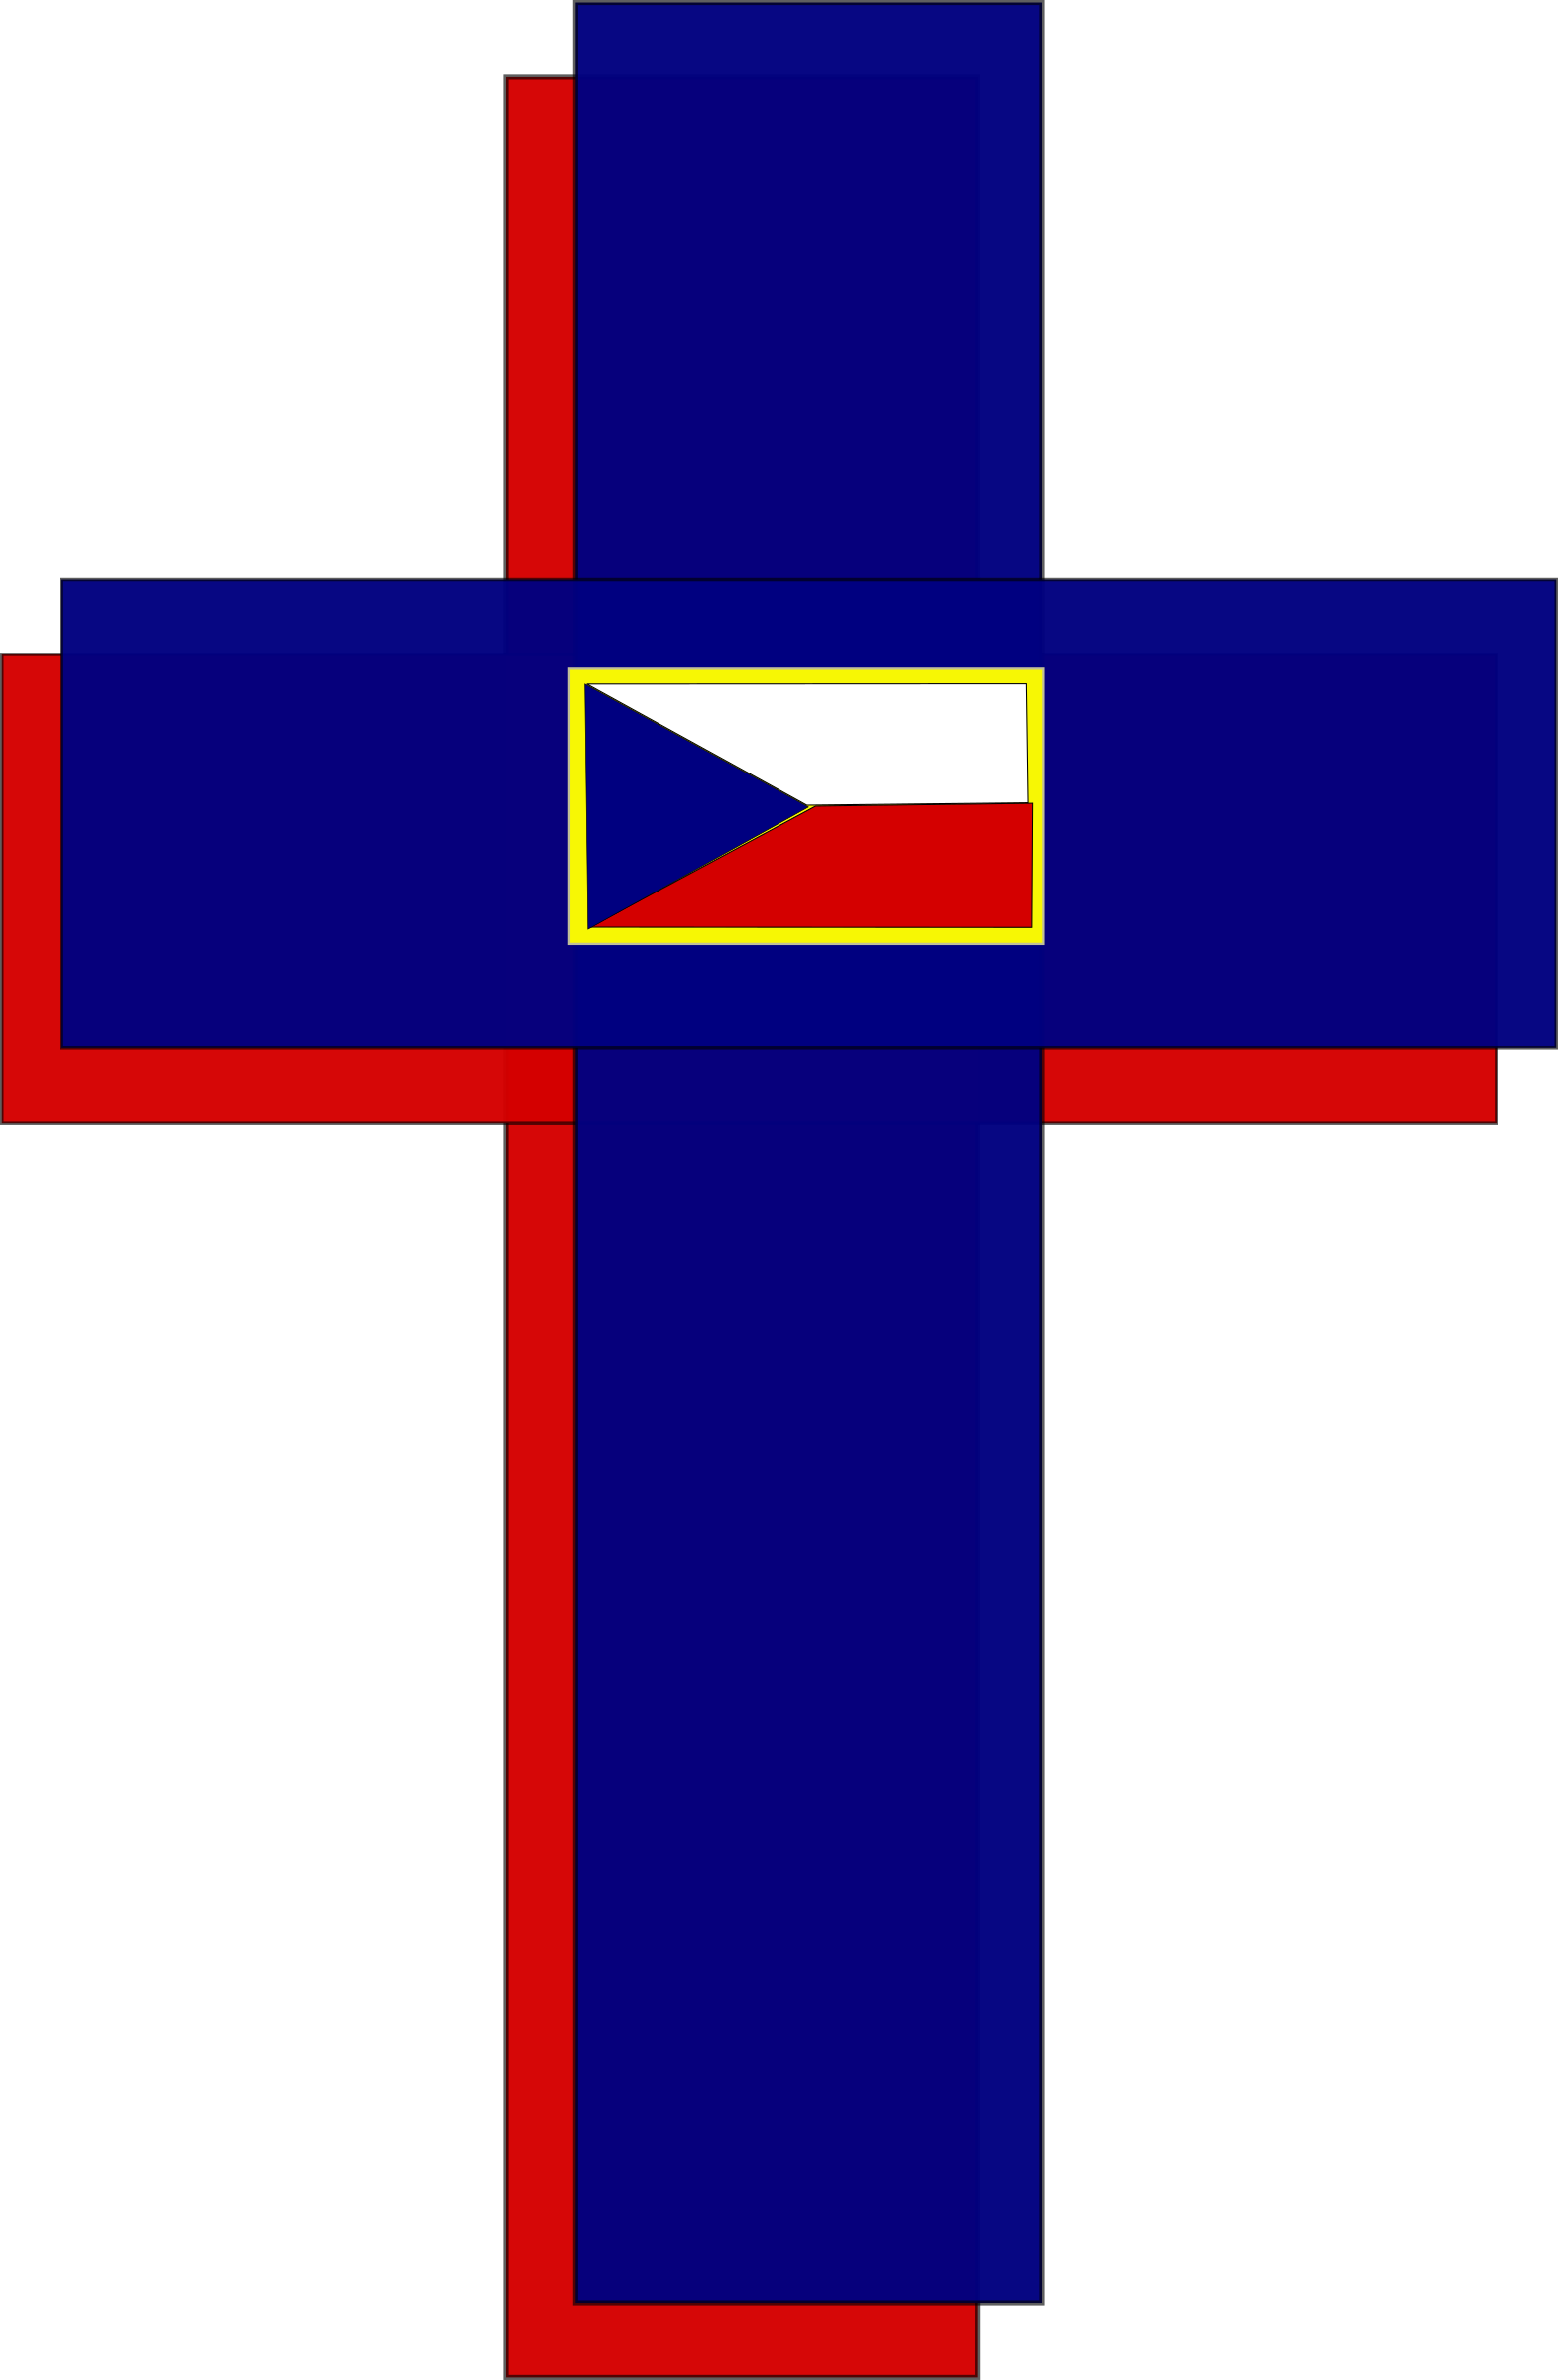 Cross flag clipart vector Clipart - Cross and Czech Flag vector